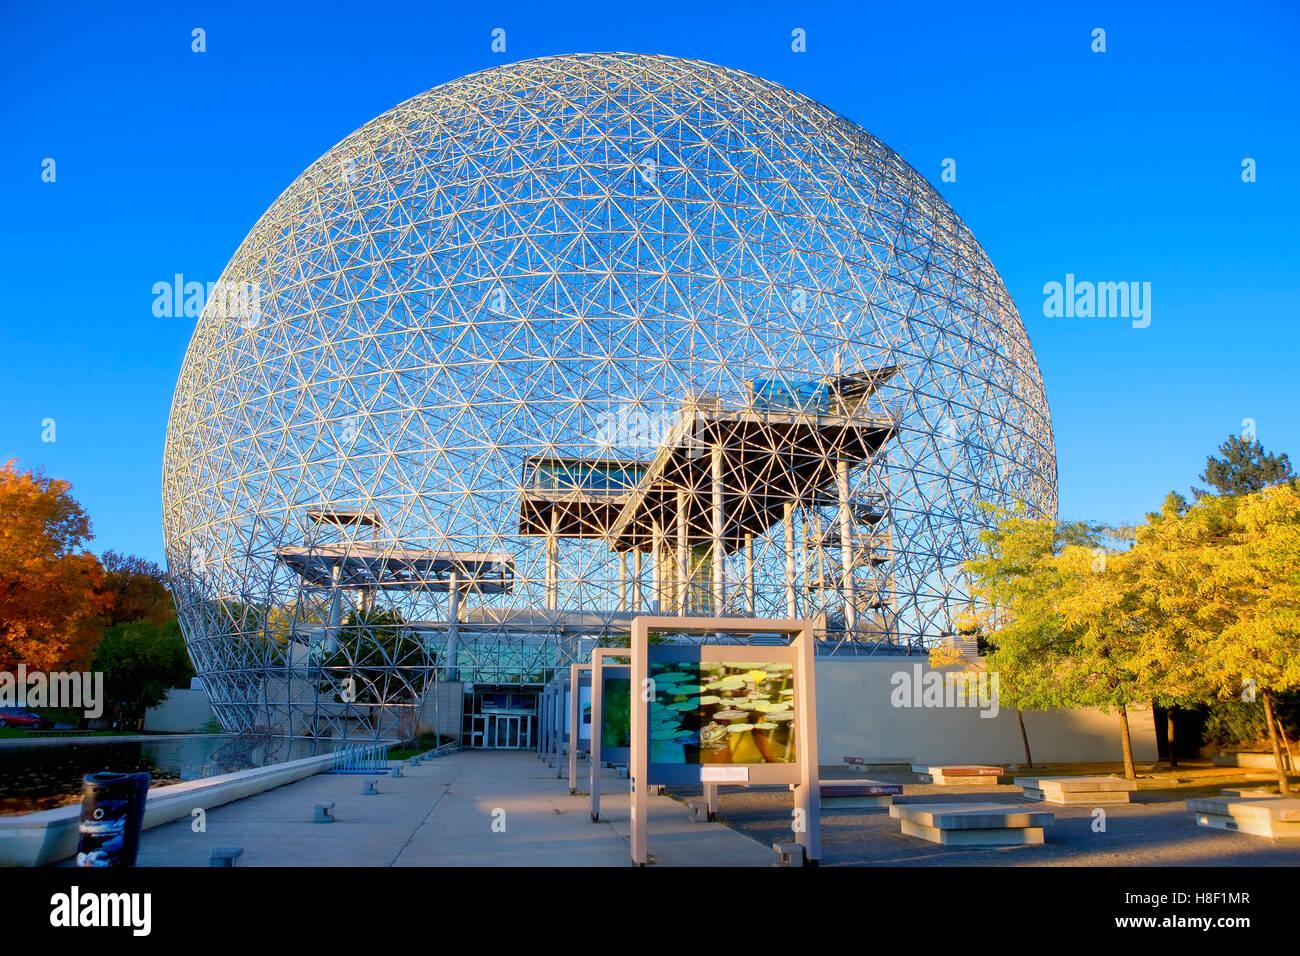 The biosphere, Parc Jean Drapeau, Montreal, Canada - Stock Image